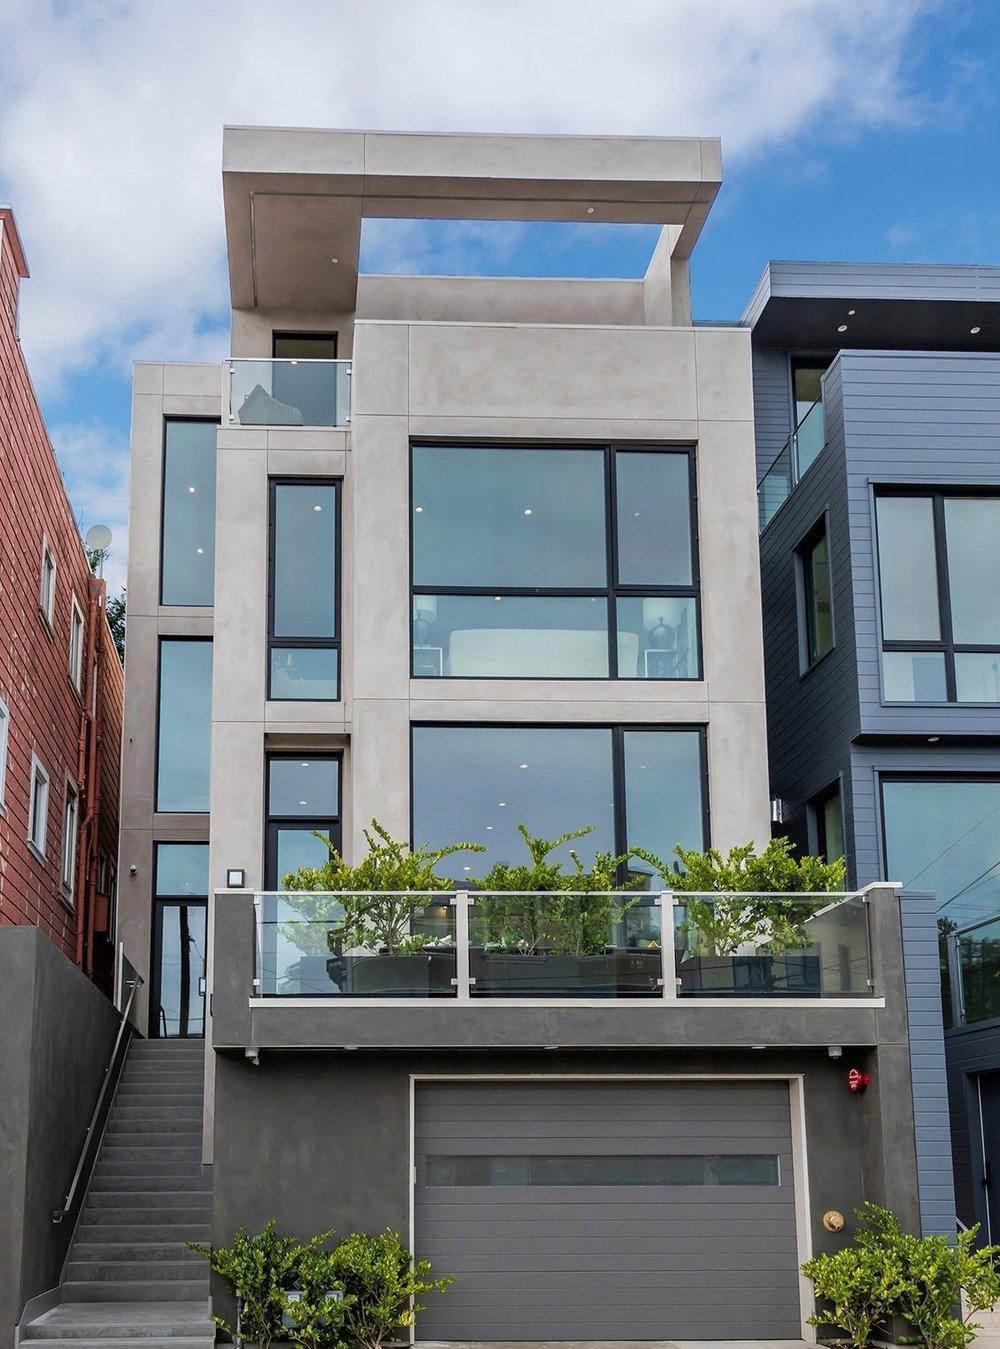 cole valley modern -  1171 Stanyan street - $3,500,000